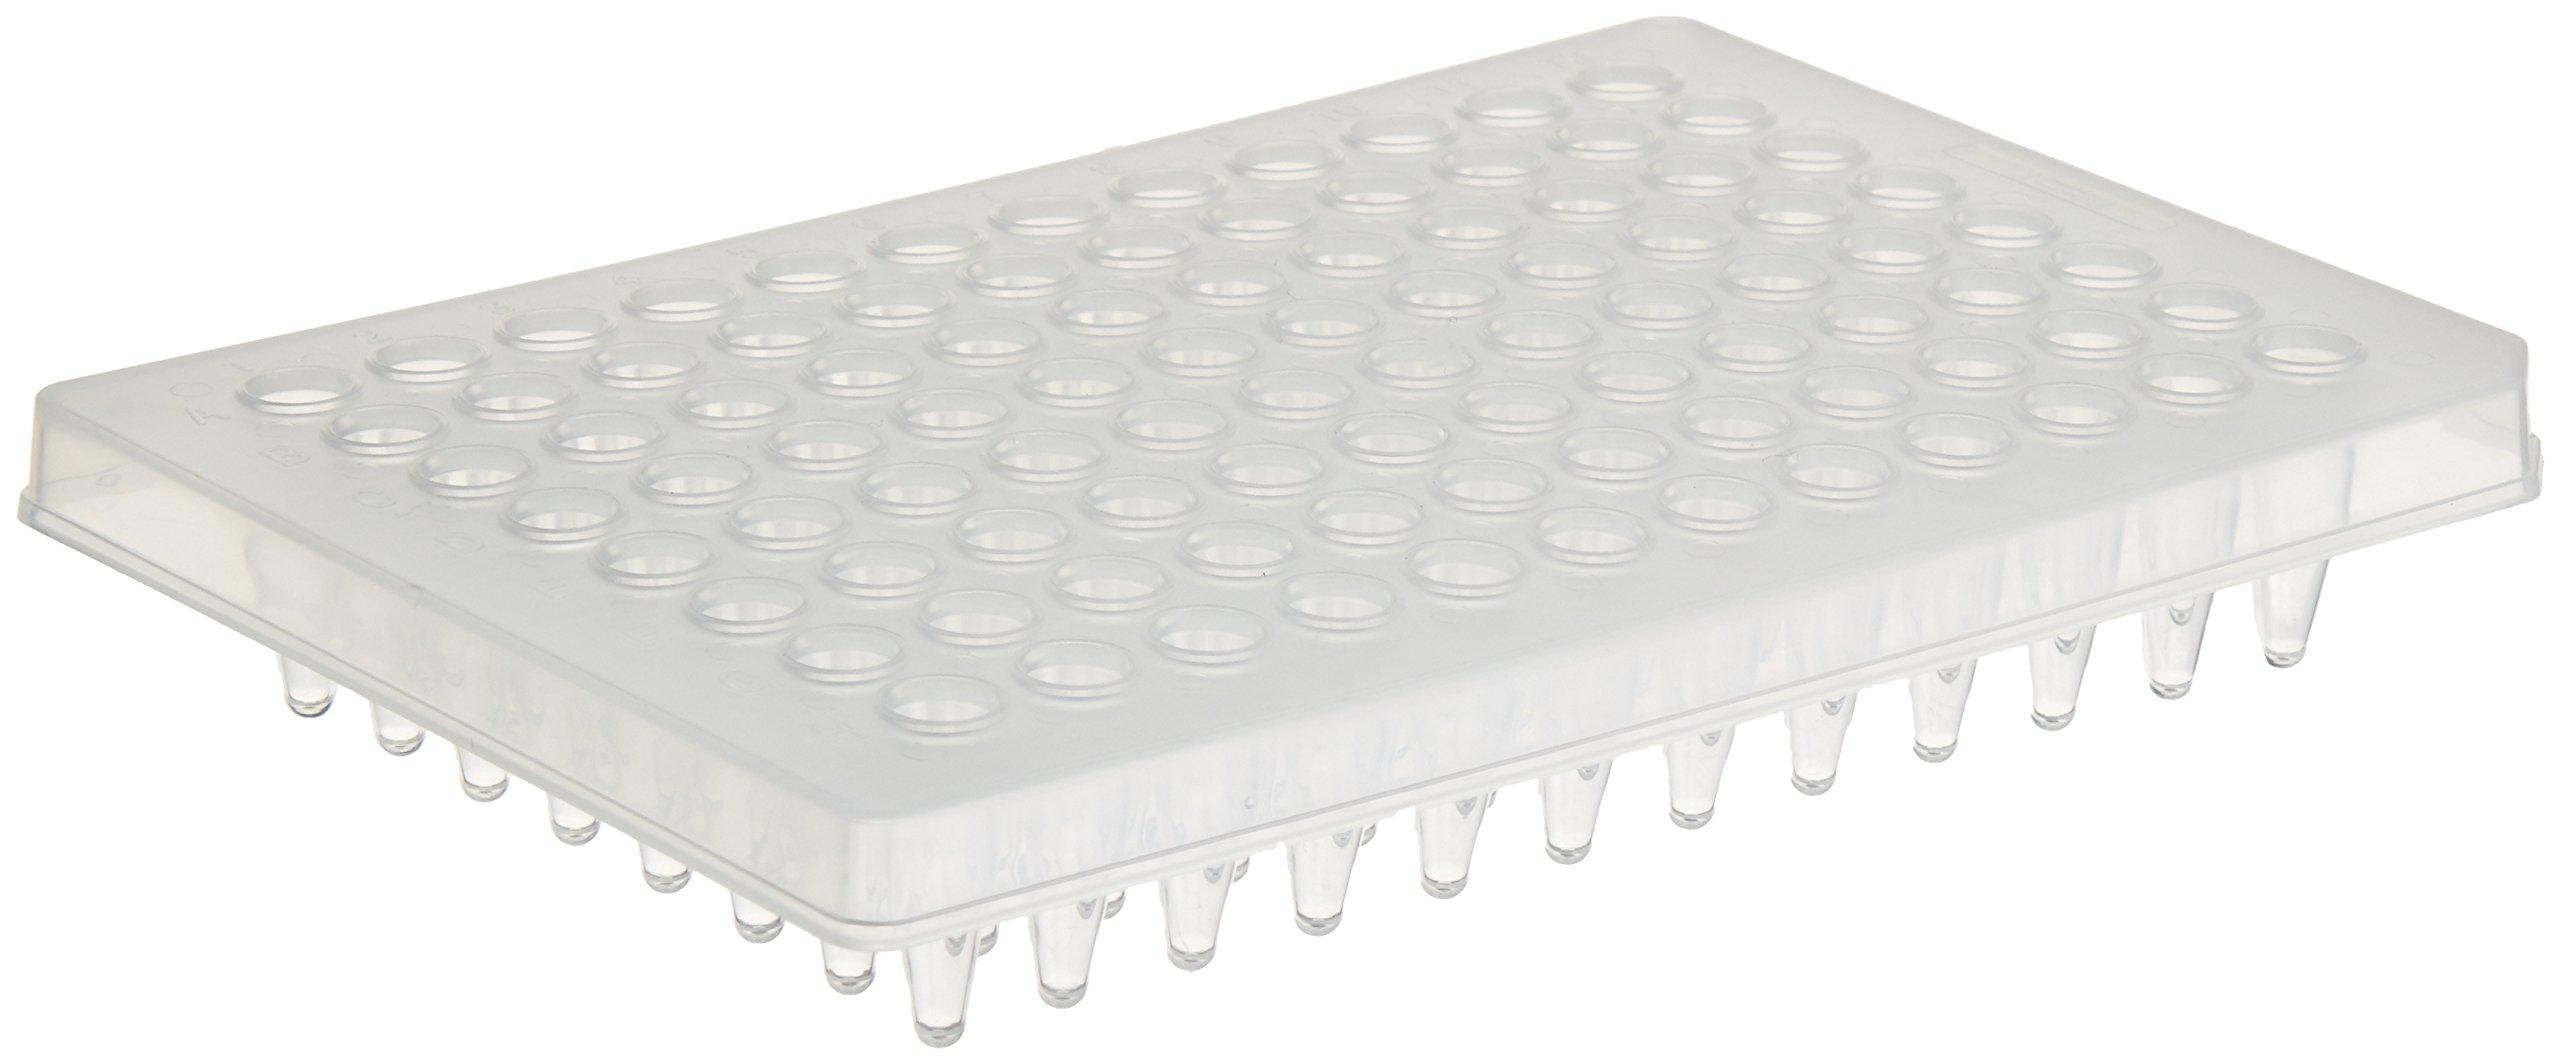 NEST Scientific USA 402301 Nest Scientific Usa 0.2 ml 96 Well PCR Plate, Semi Skirt, Clear